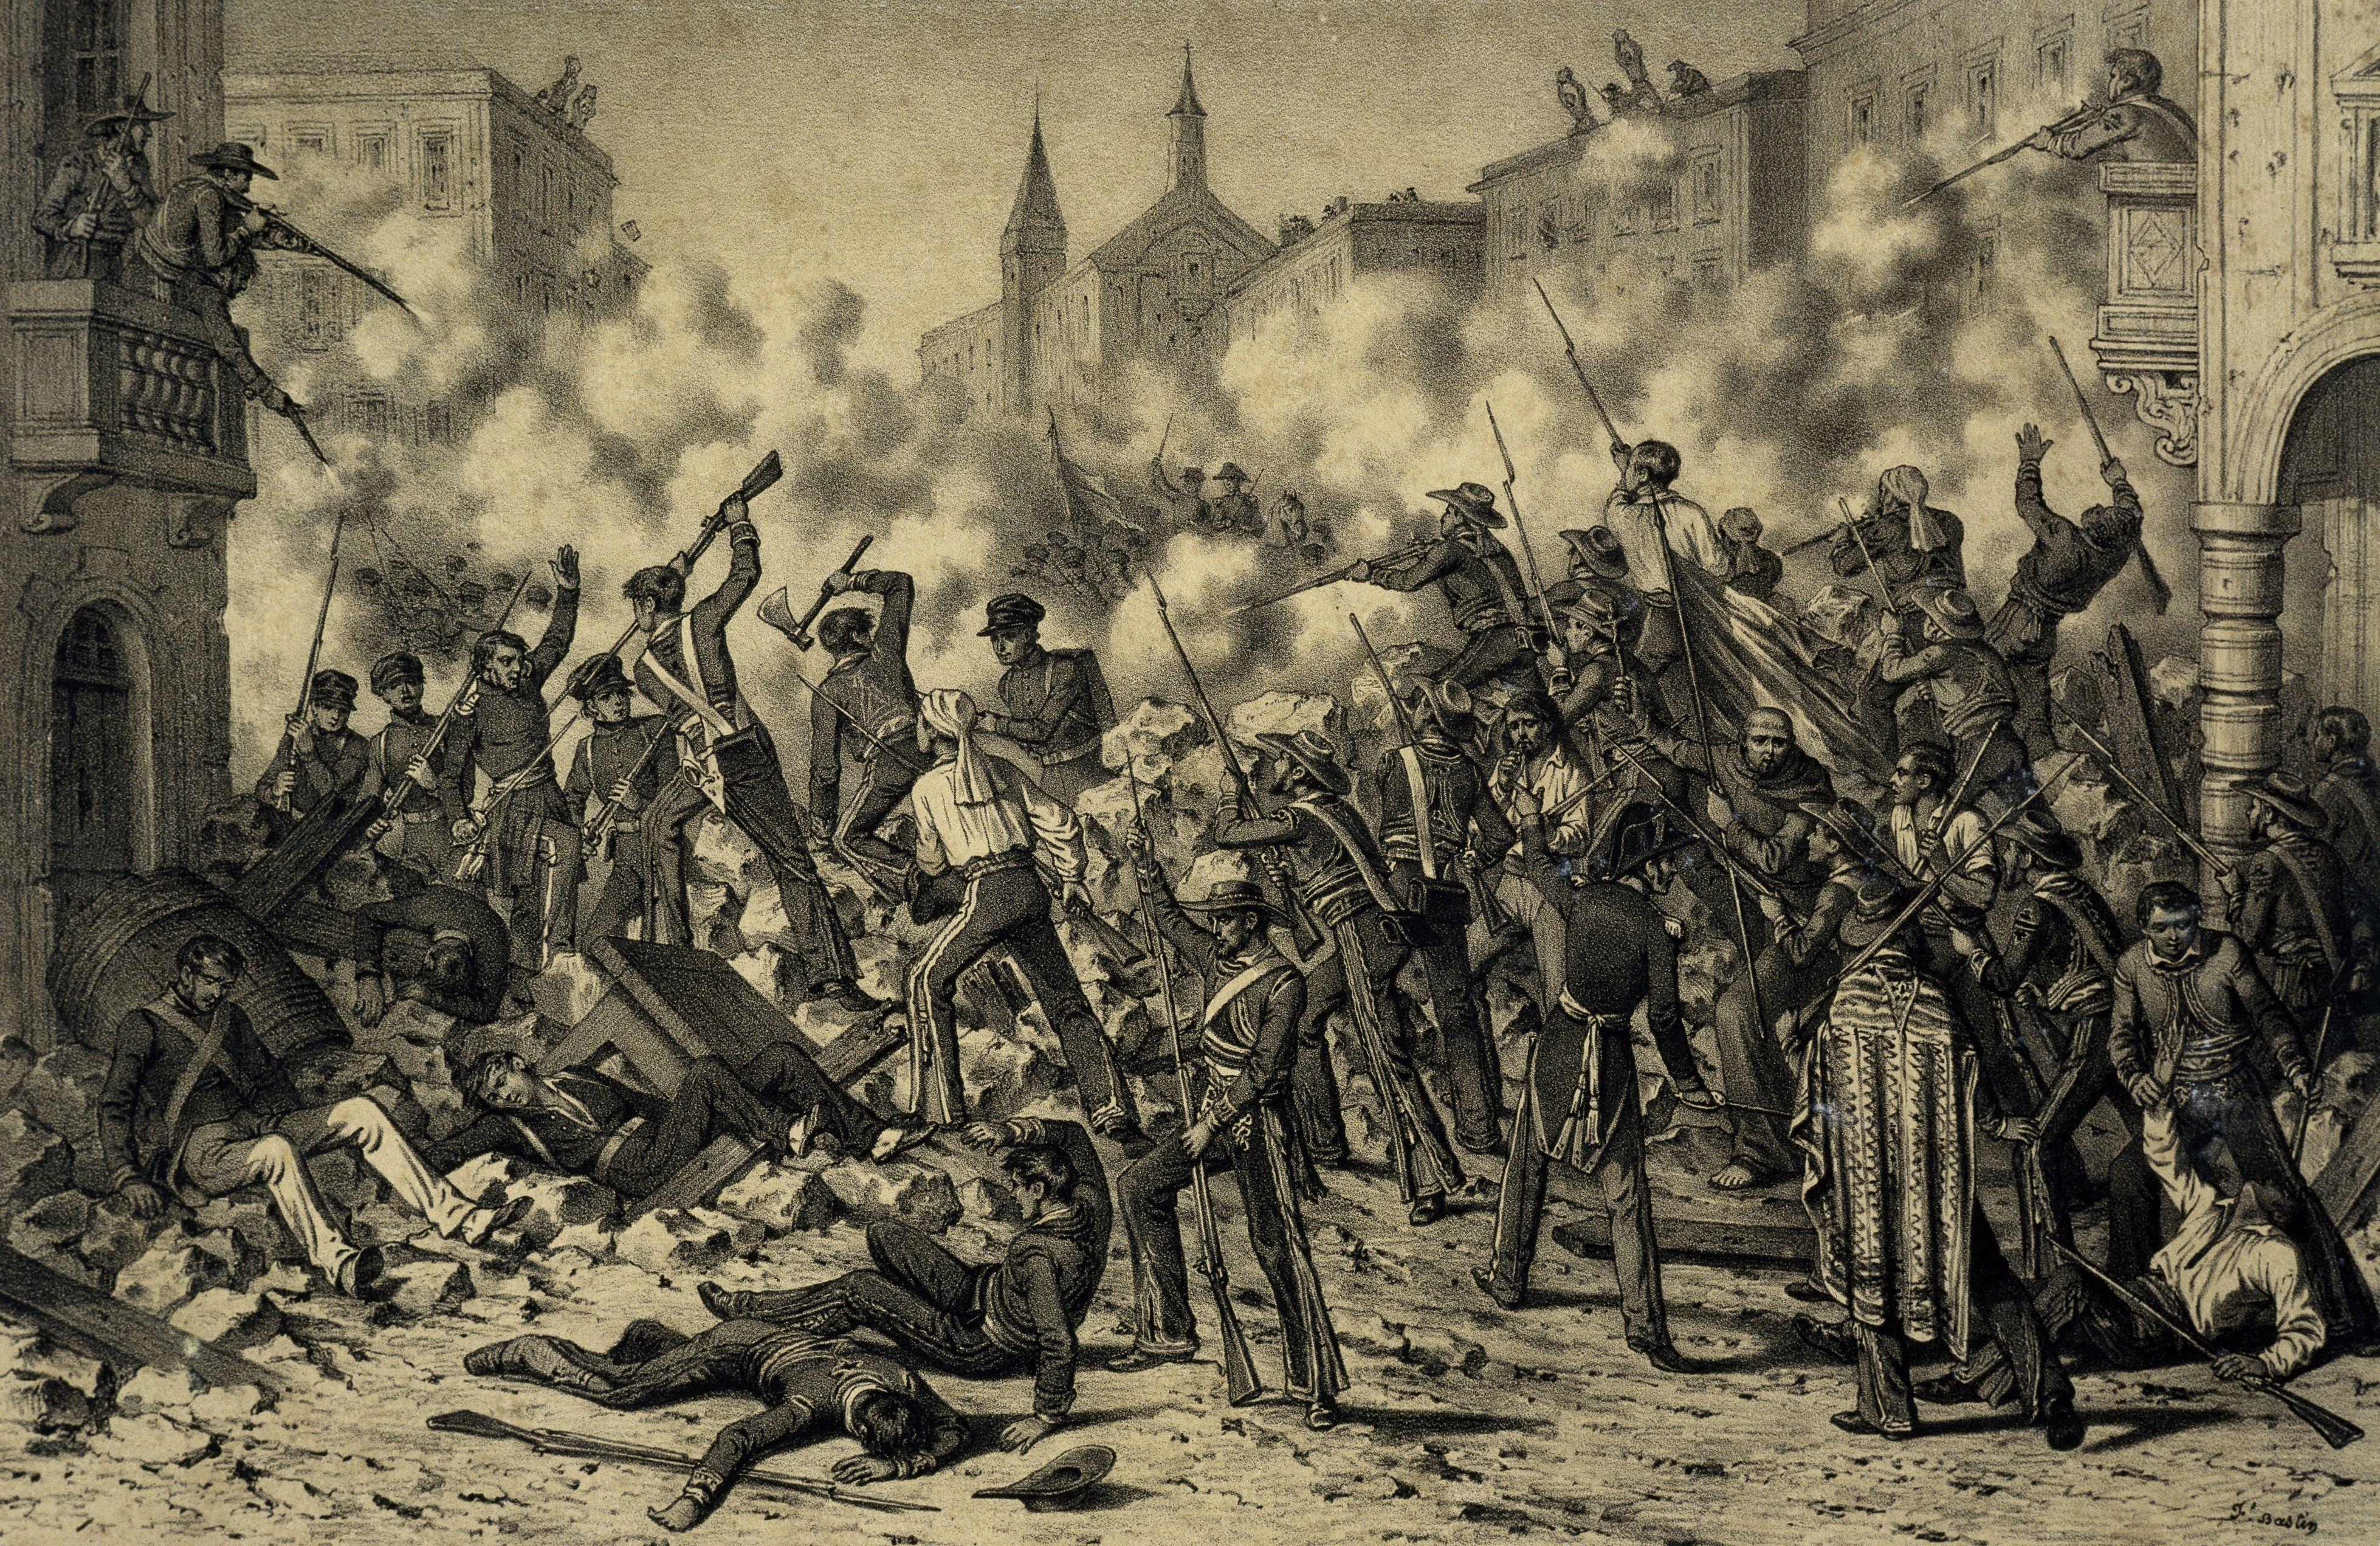 Battle of Monterrey, September 23, 1846. Mexican-American War, Mexico, 19th century